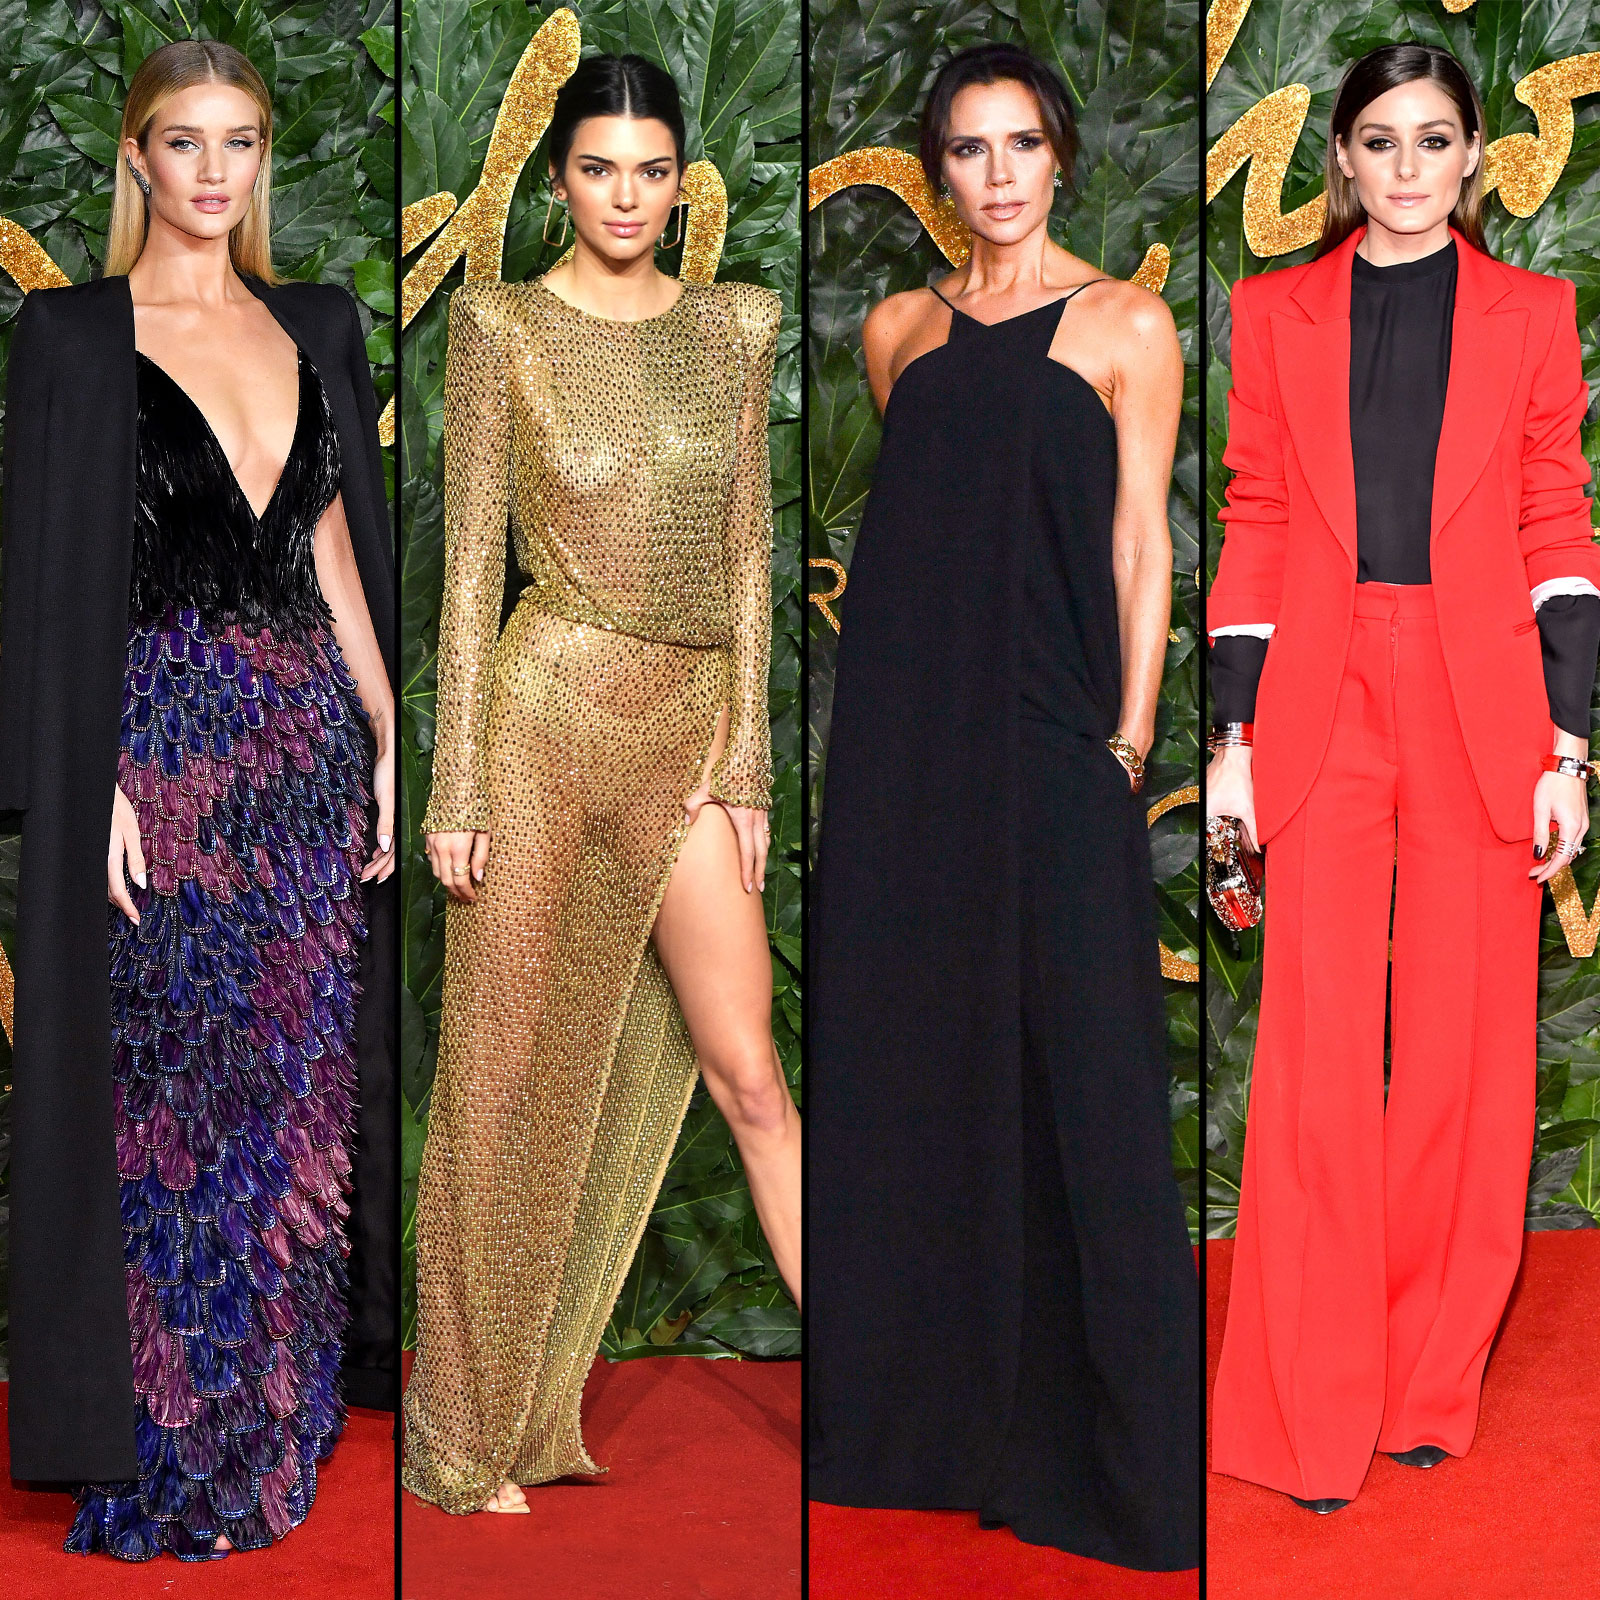 British Fashion Awards 2018 Red Carpet: Celeb Dress Pics